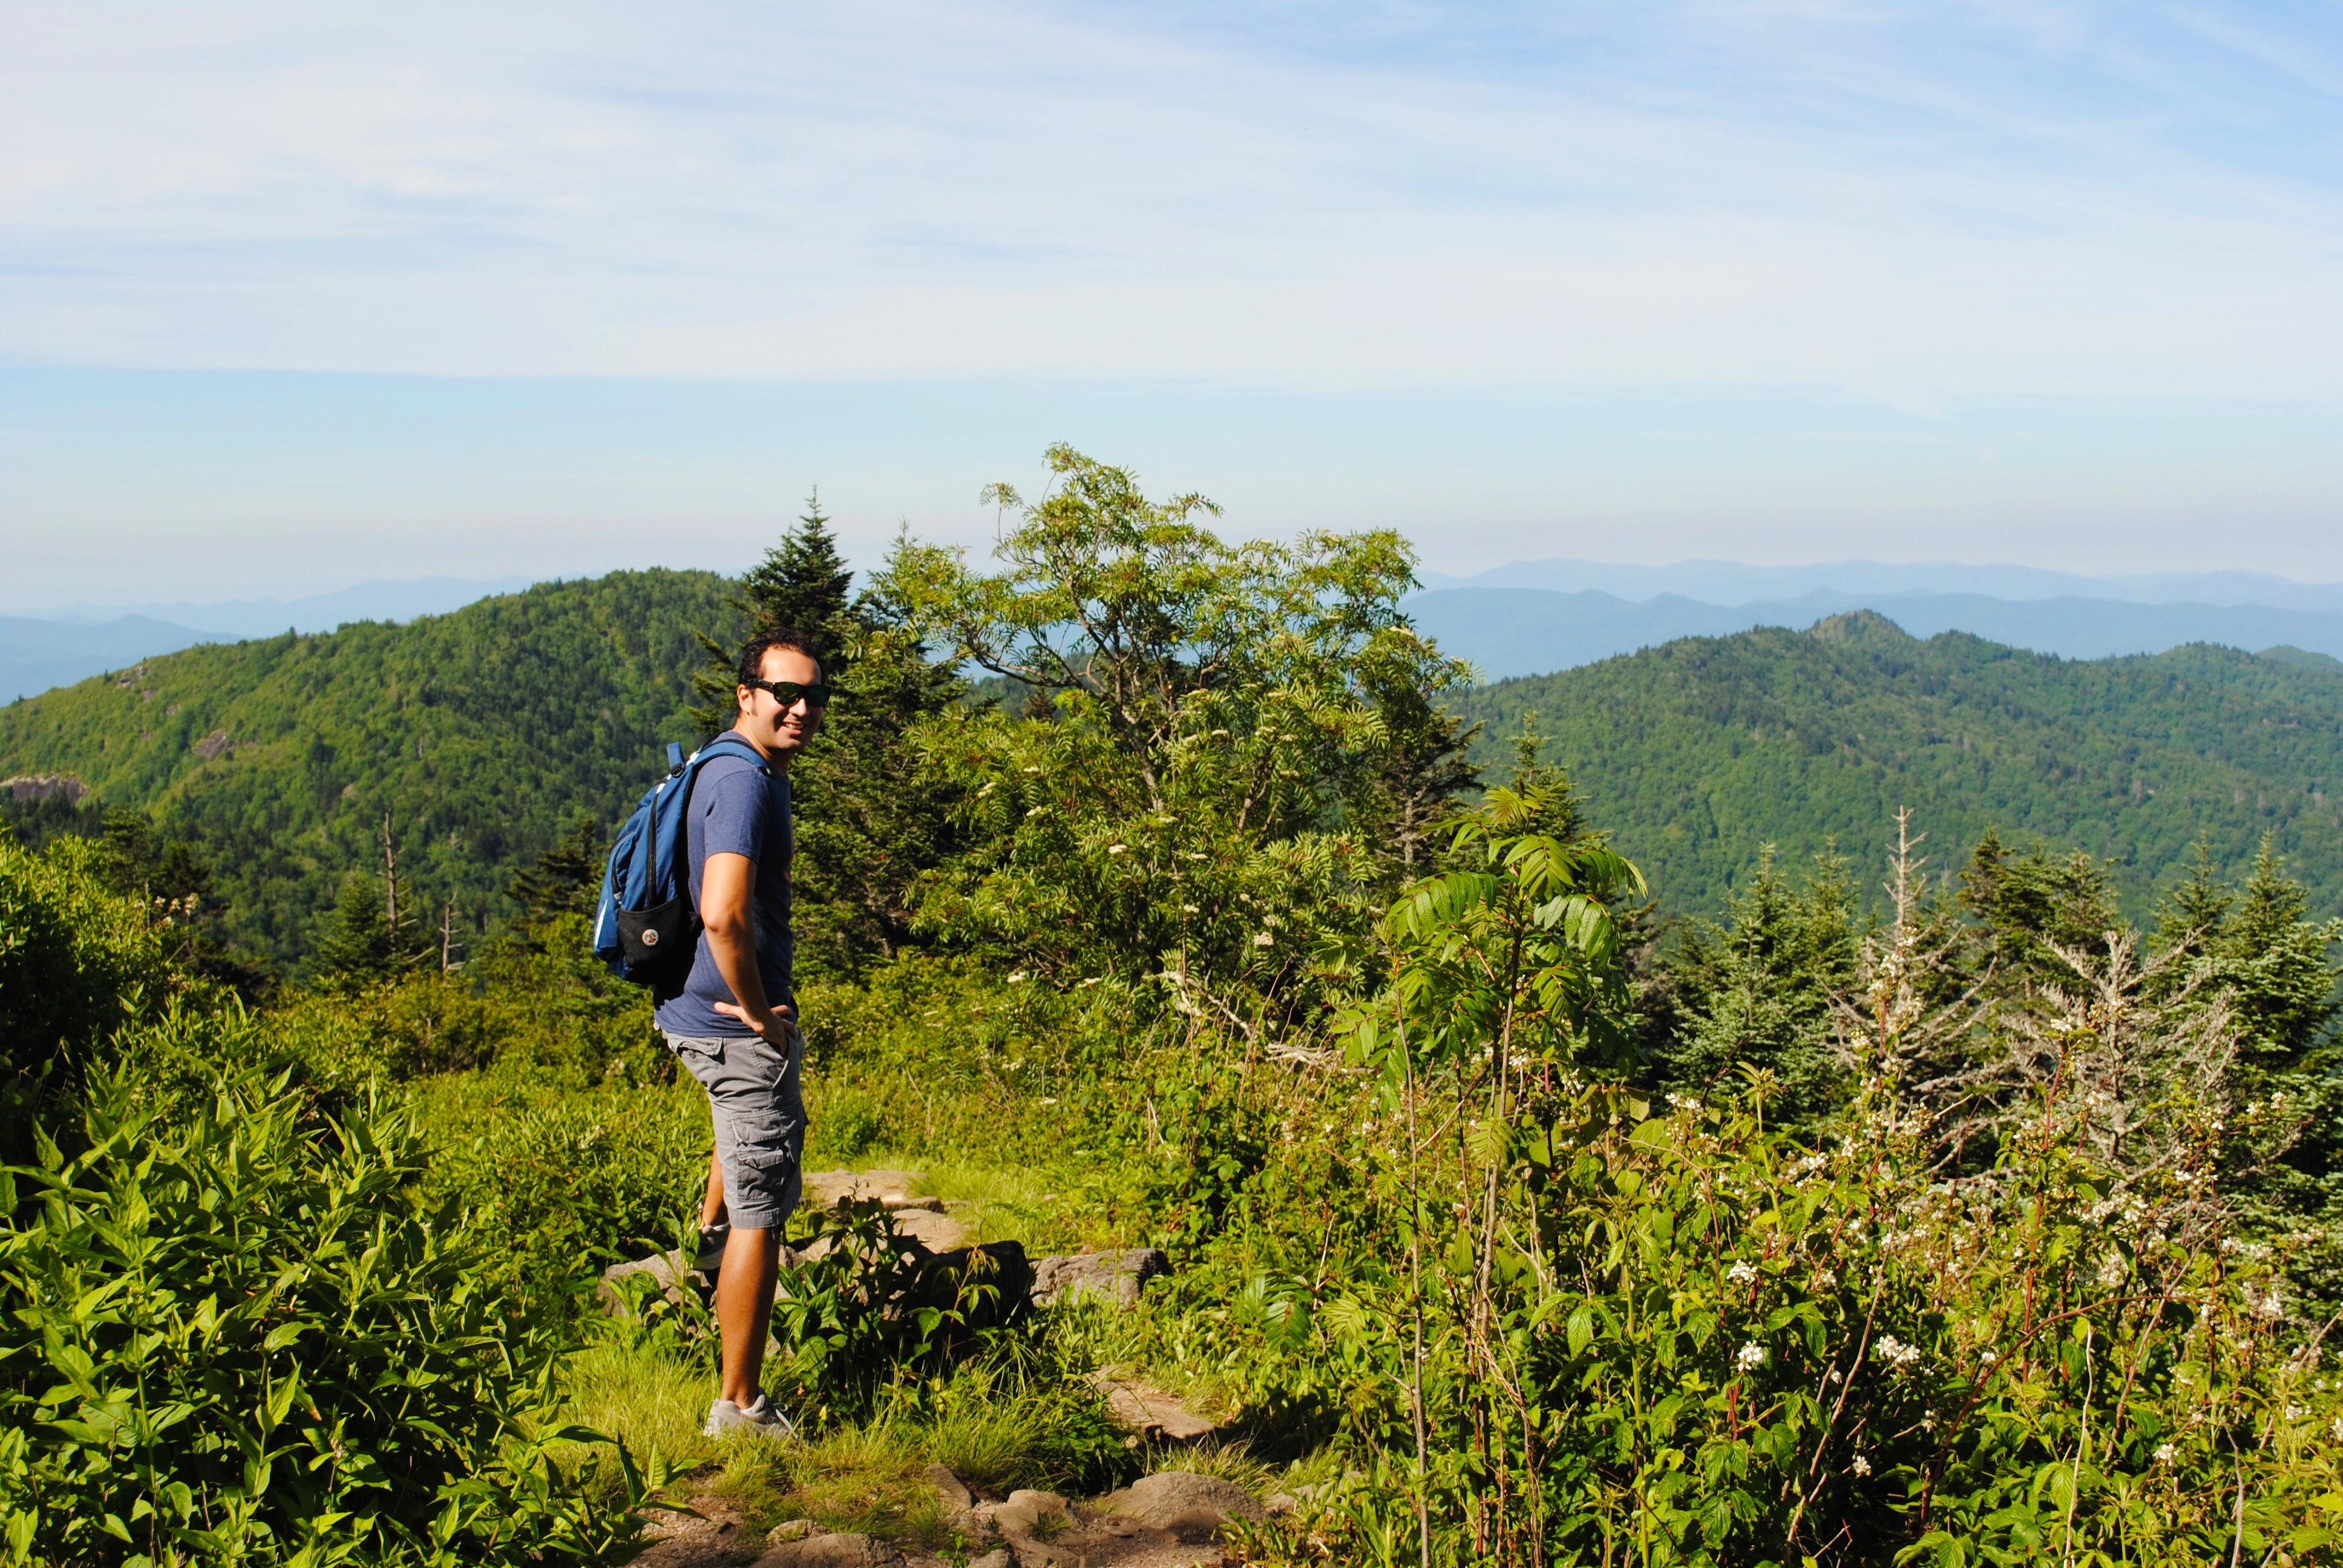 North Carolina - Blue Ridge Parkway - Hiking